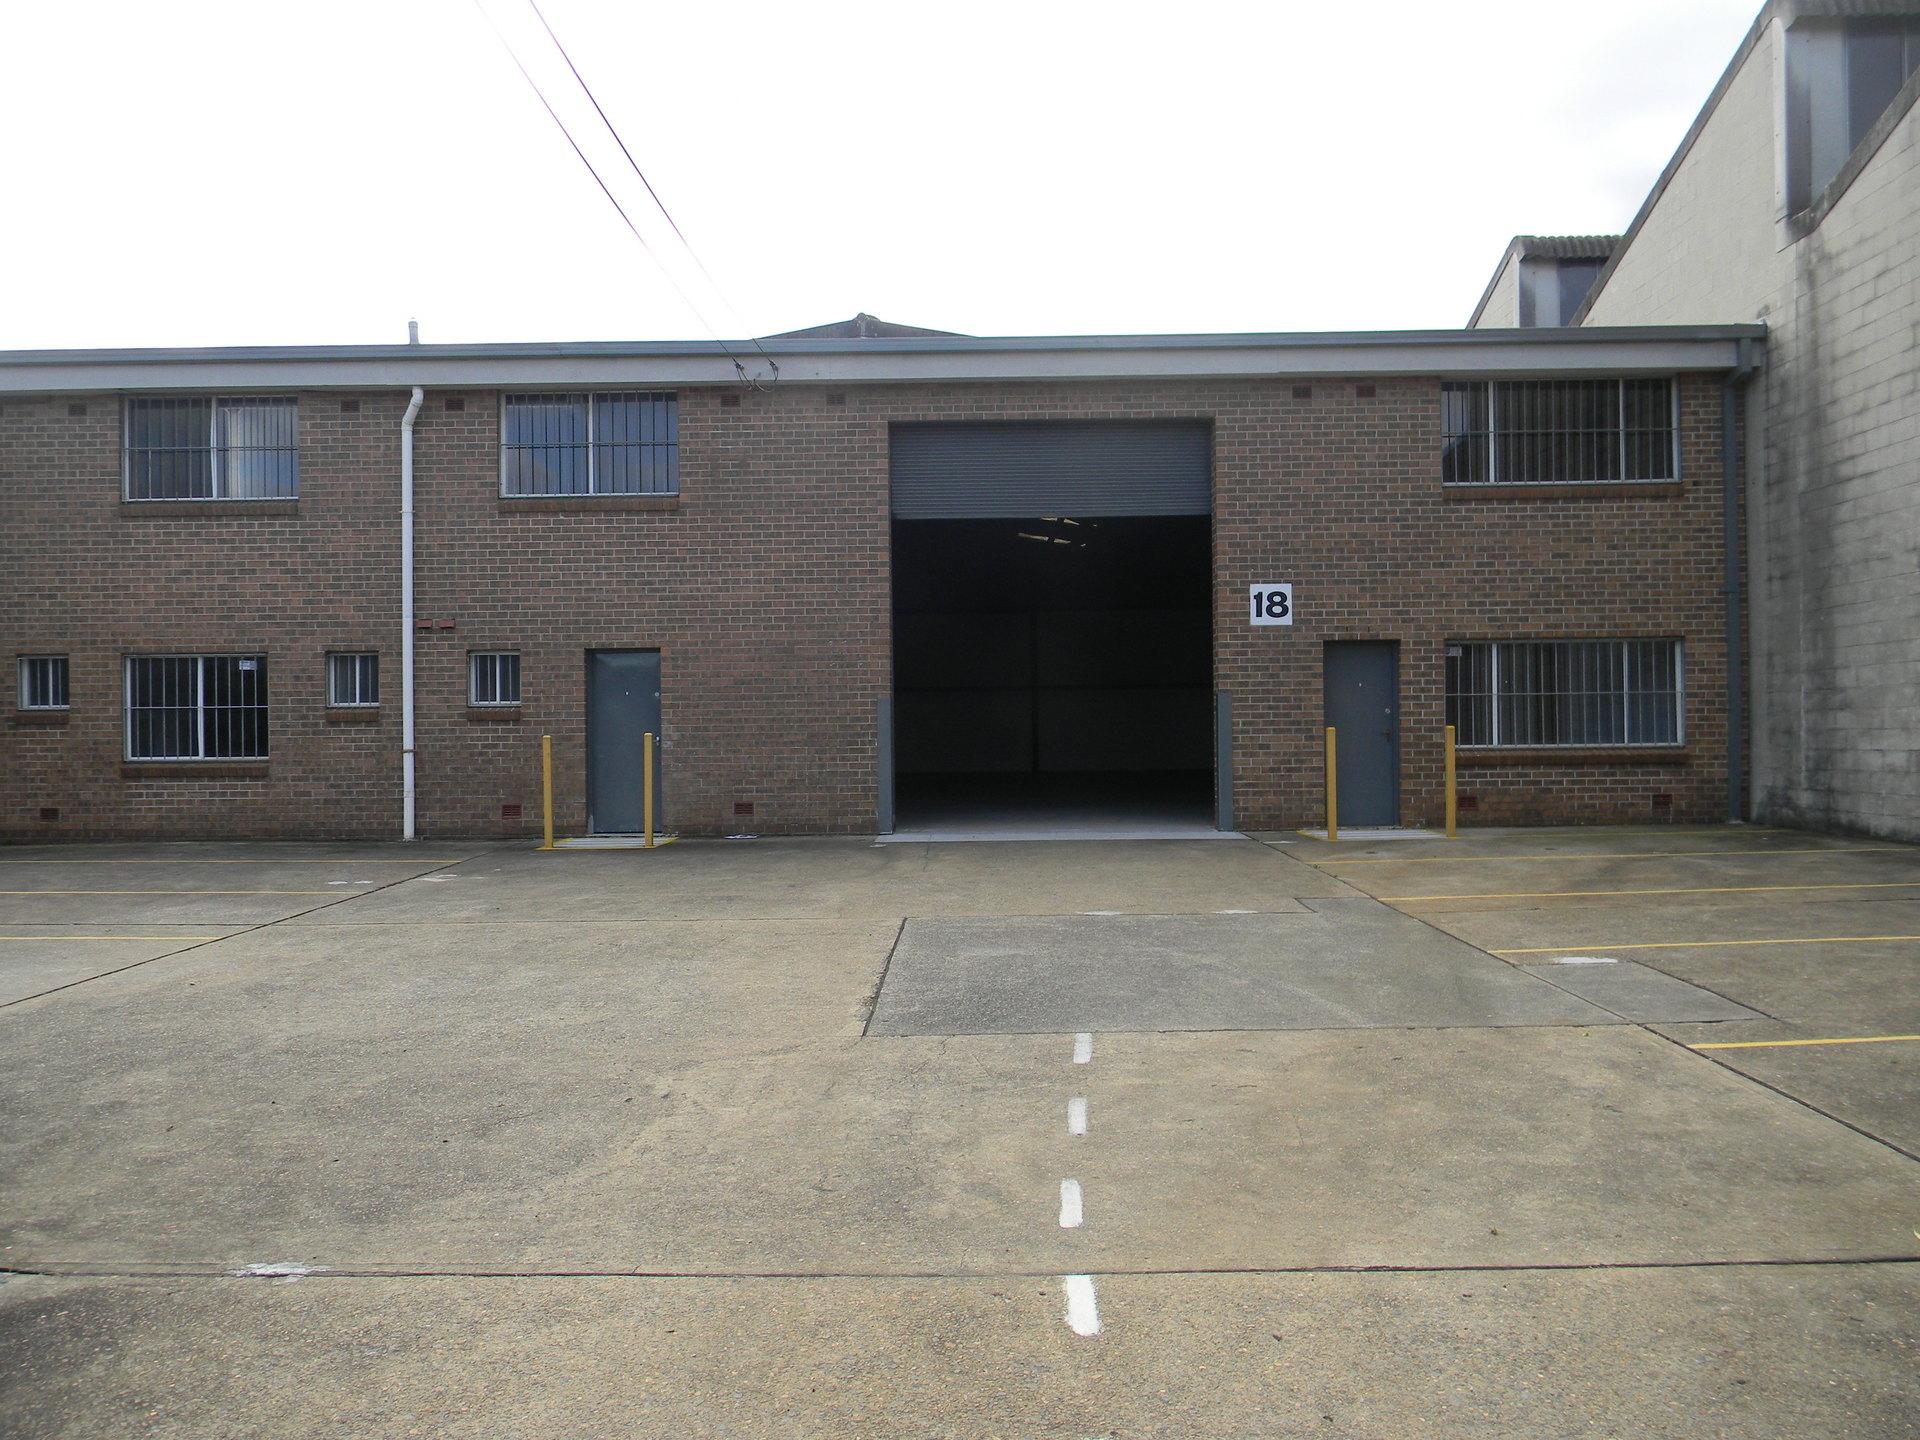 Warehouse / Ofice - 605*sqm approx